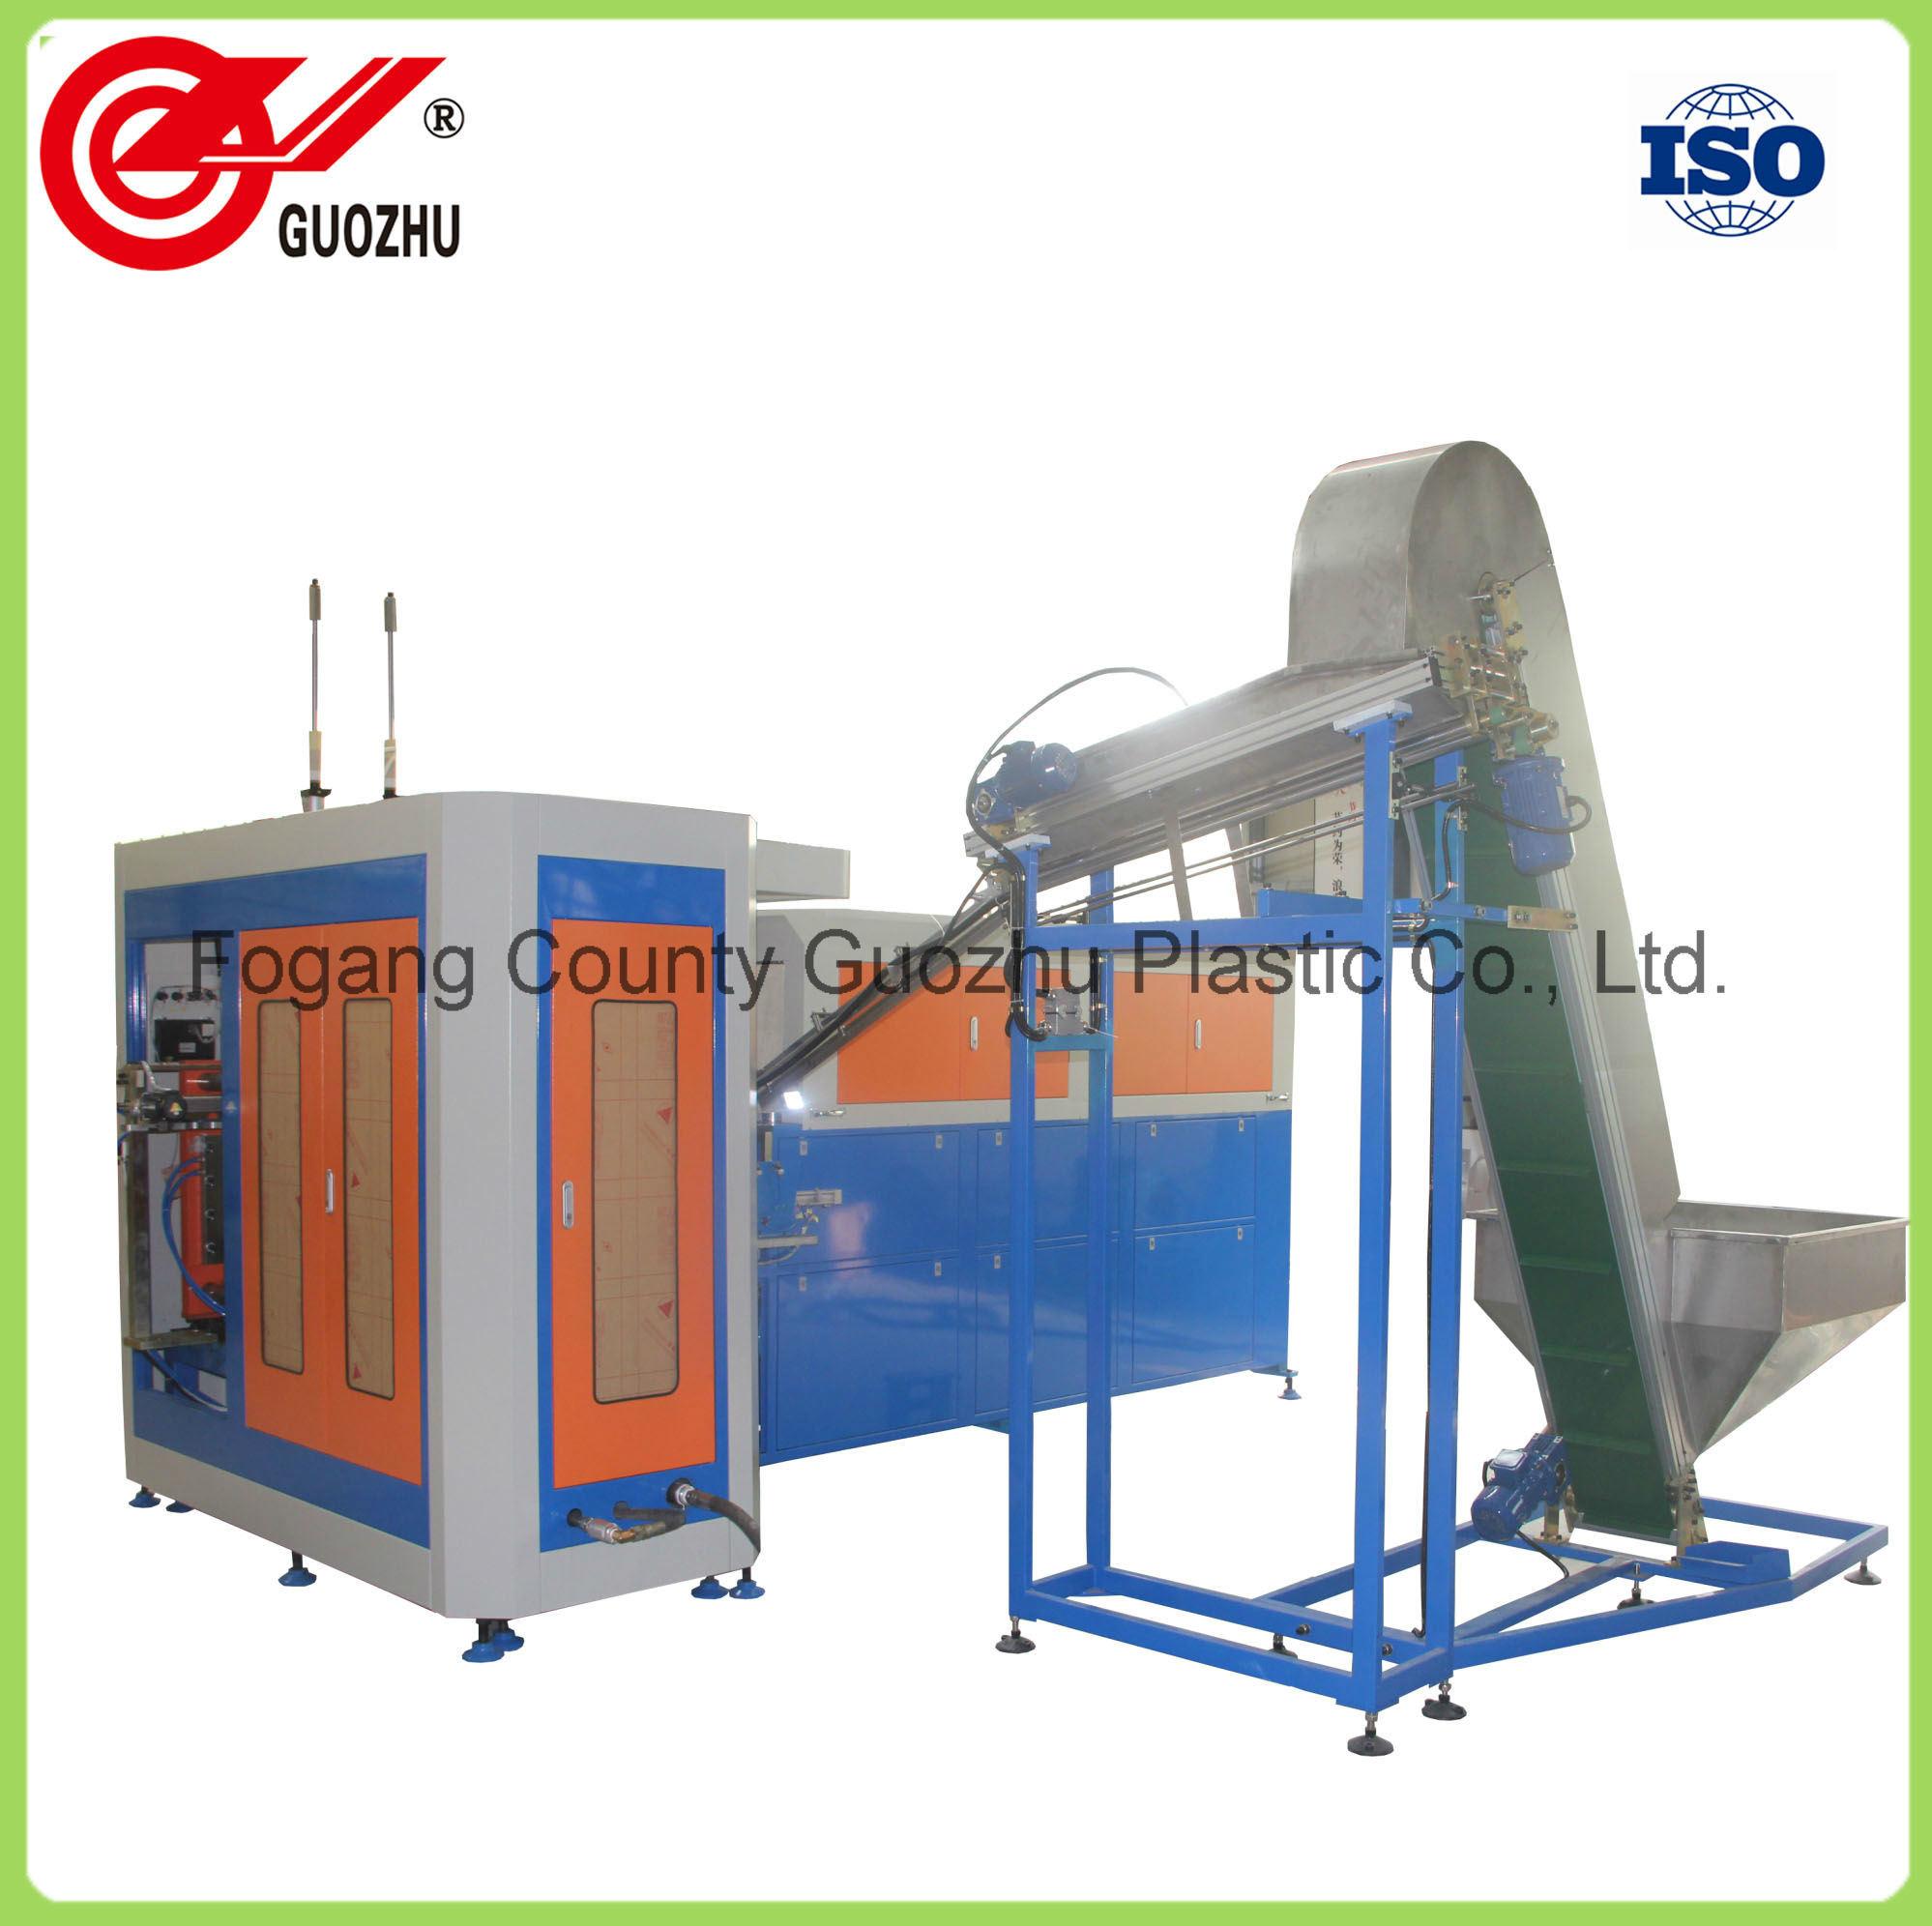 6 Cavity Automatic Blow Molding Machine Below 5liter